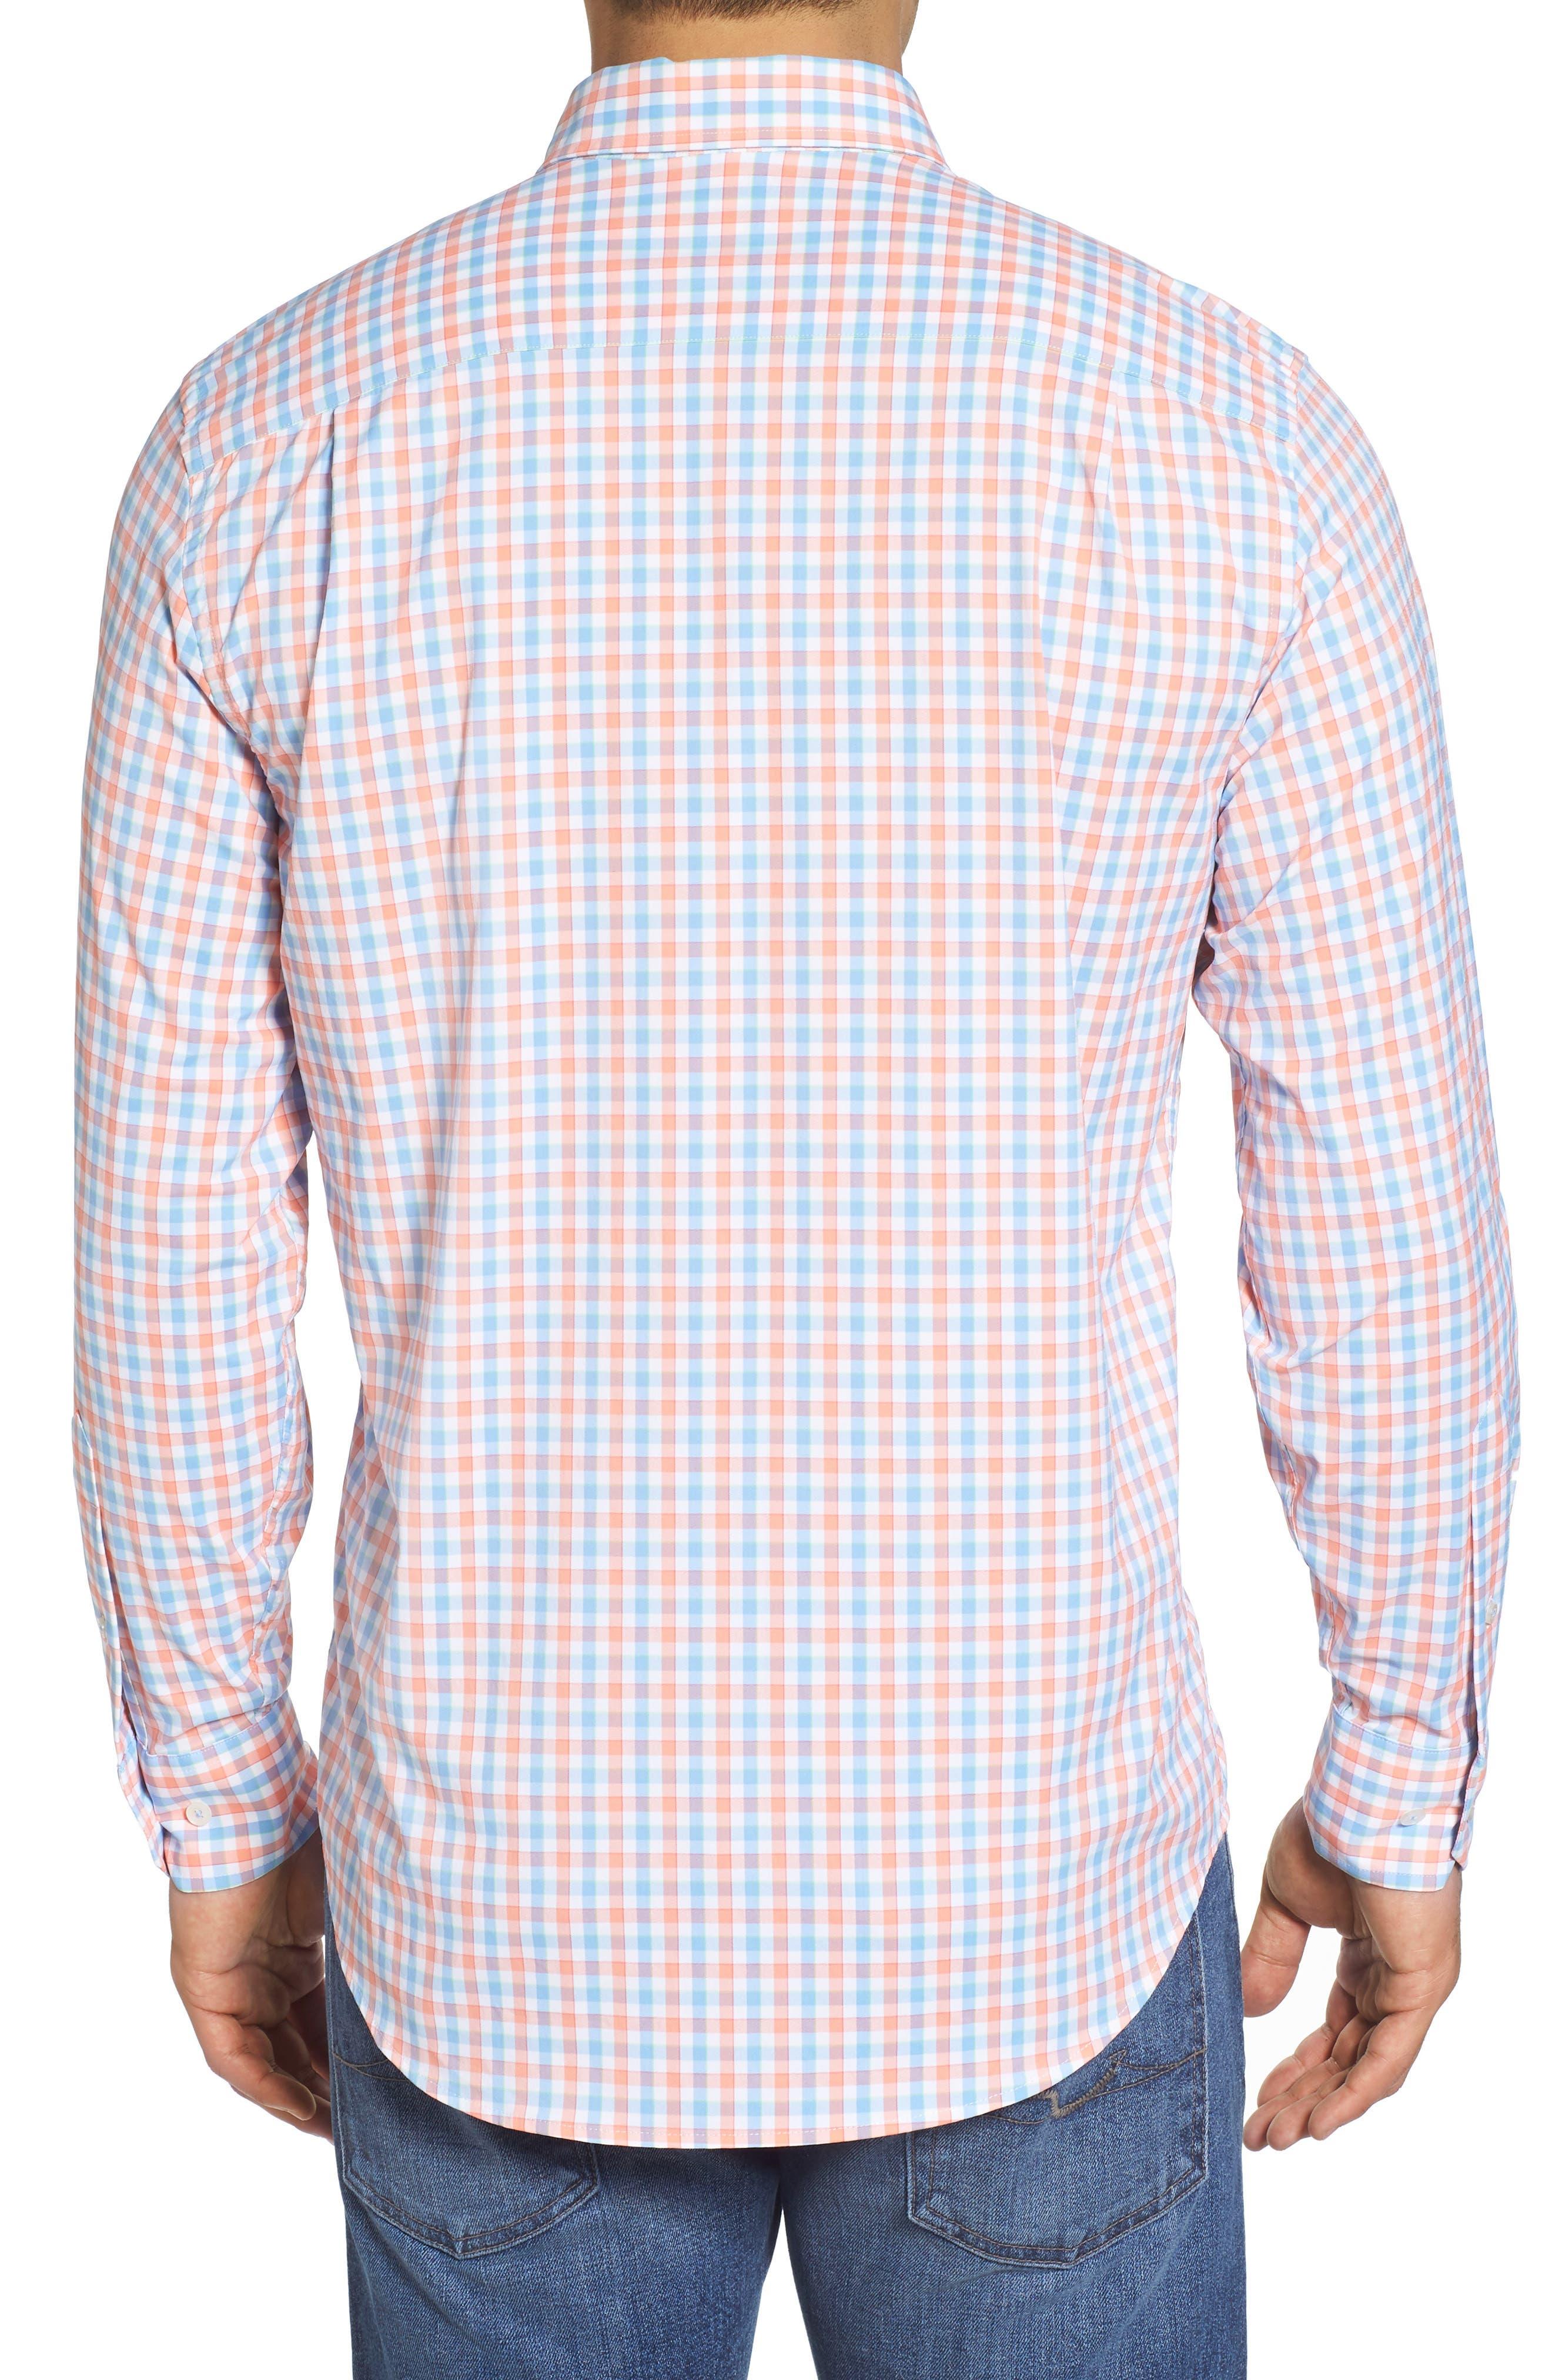 Market Square Regular Fit Stretch Check Sport Shirt,                             Alternate thumbnail 2, color,                             801